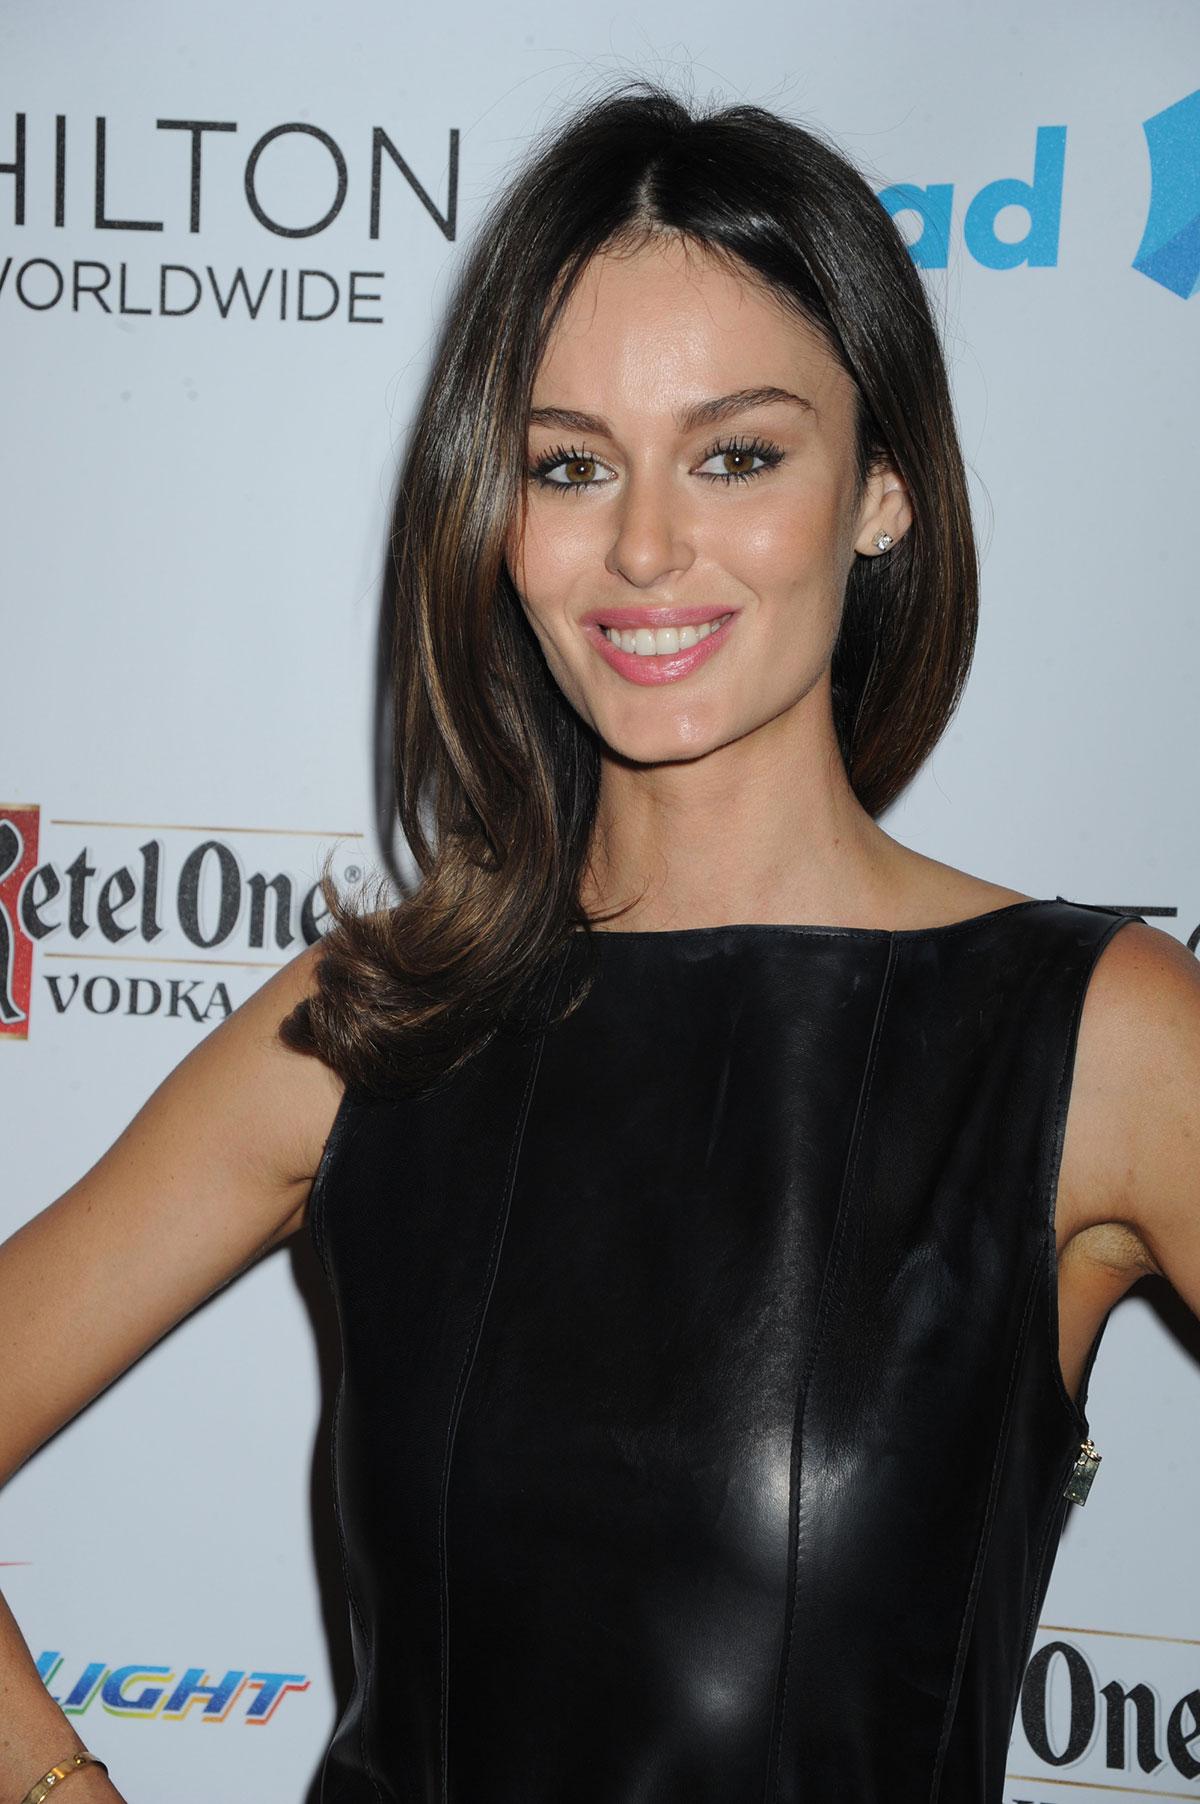 Nicole Trunfio attends the 25th Annual GLAAD Media Awards